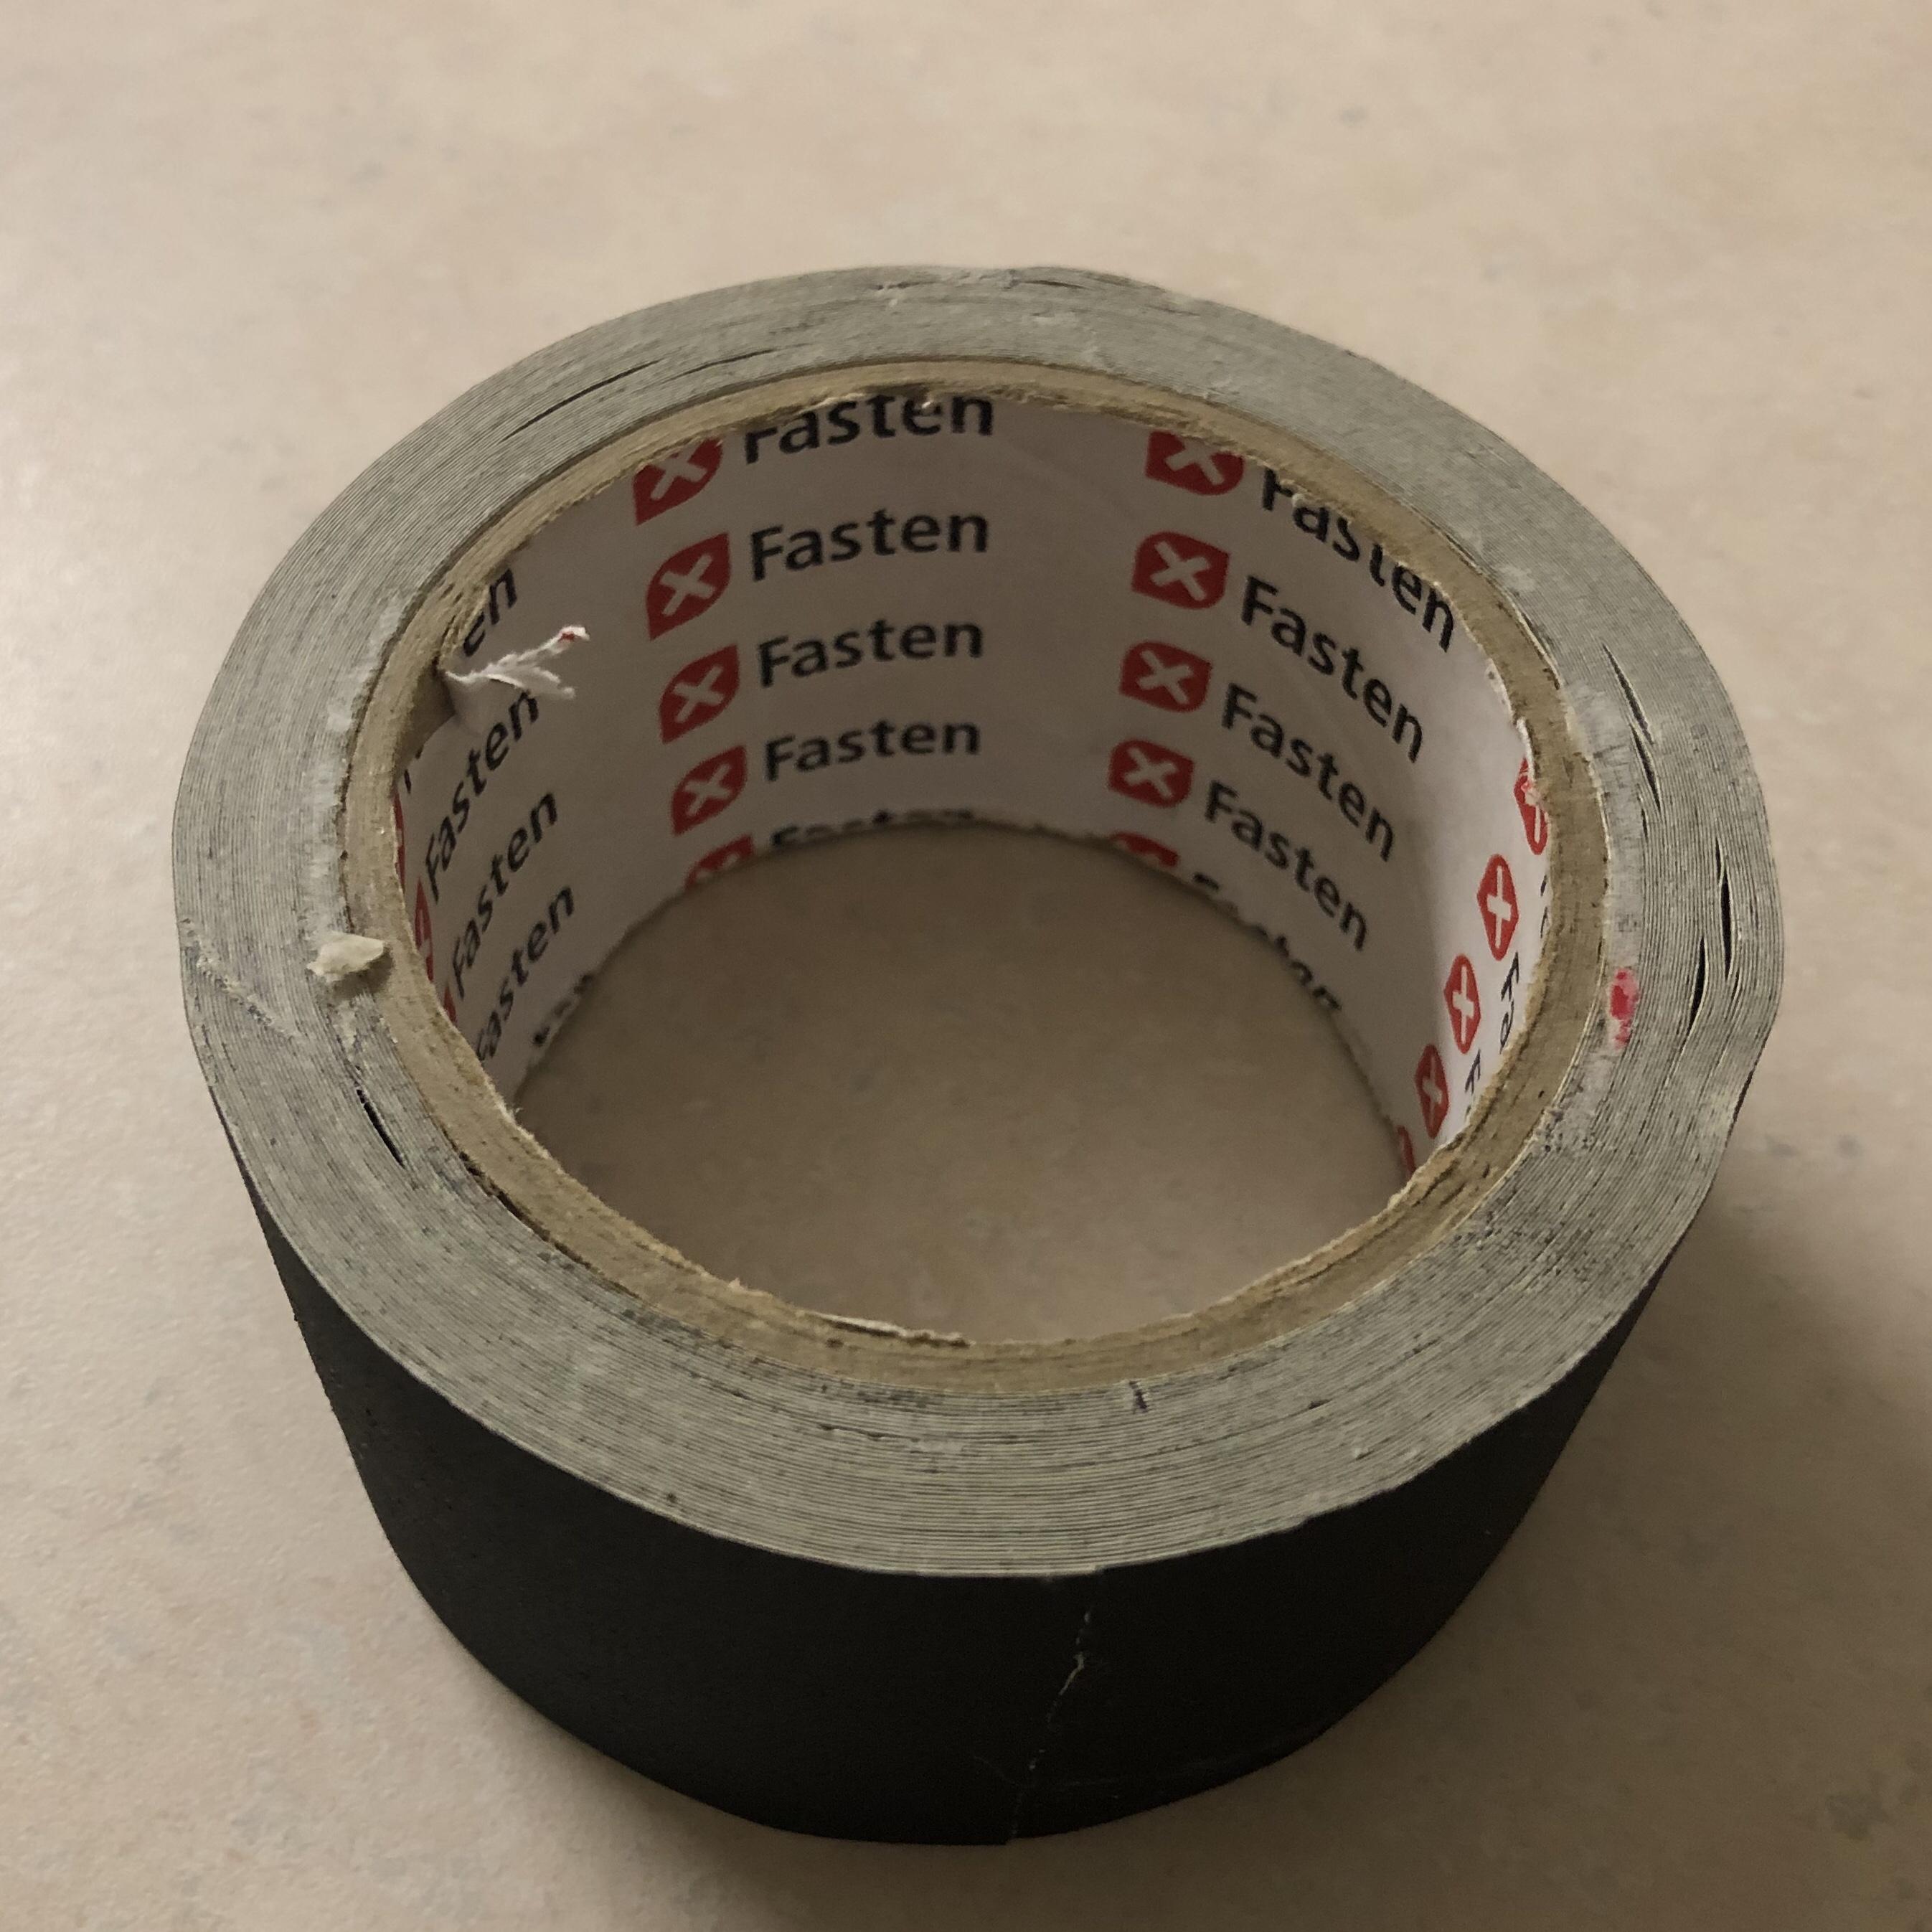 A roll of gaffer tape